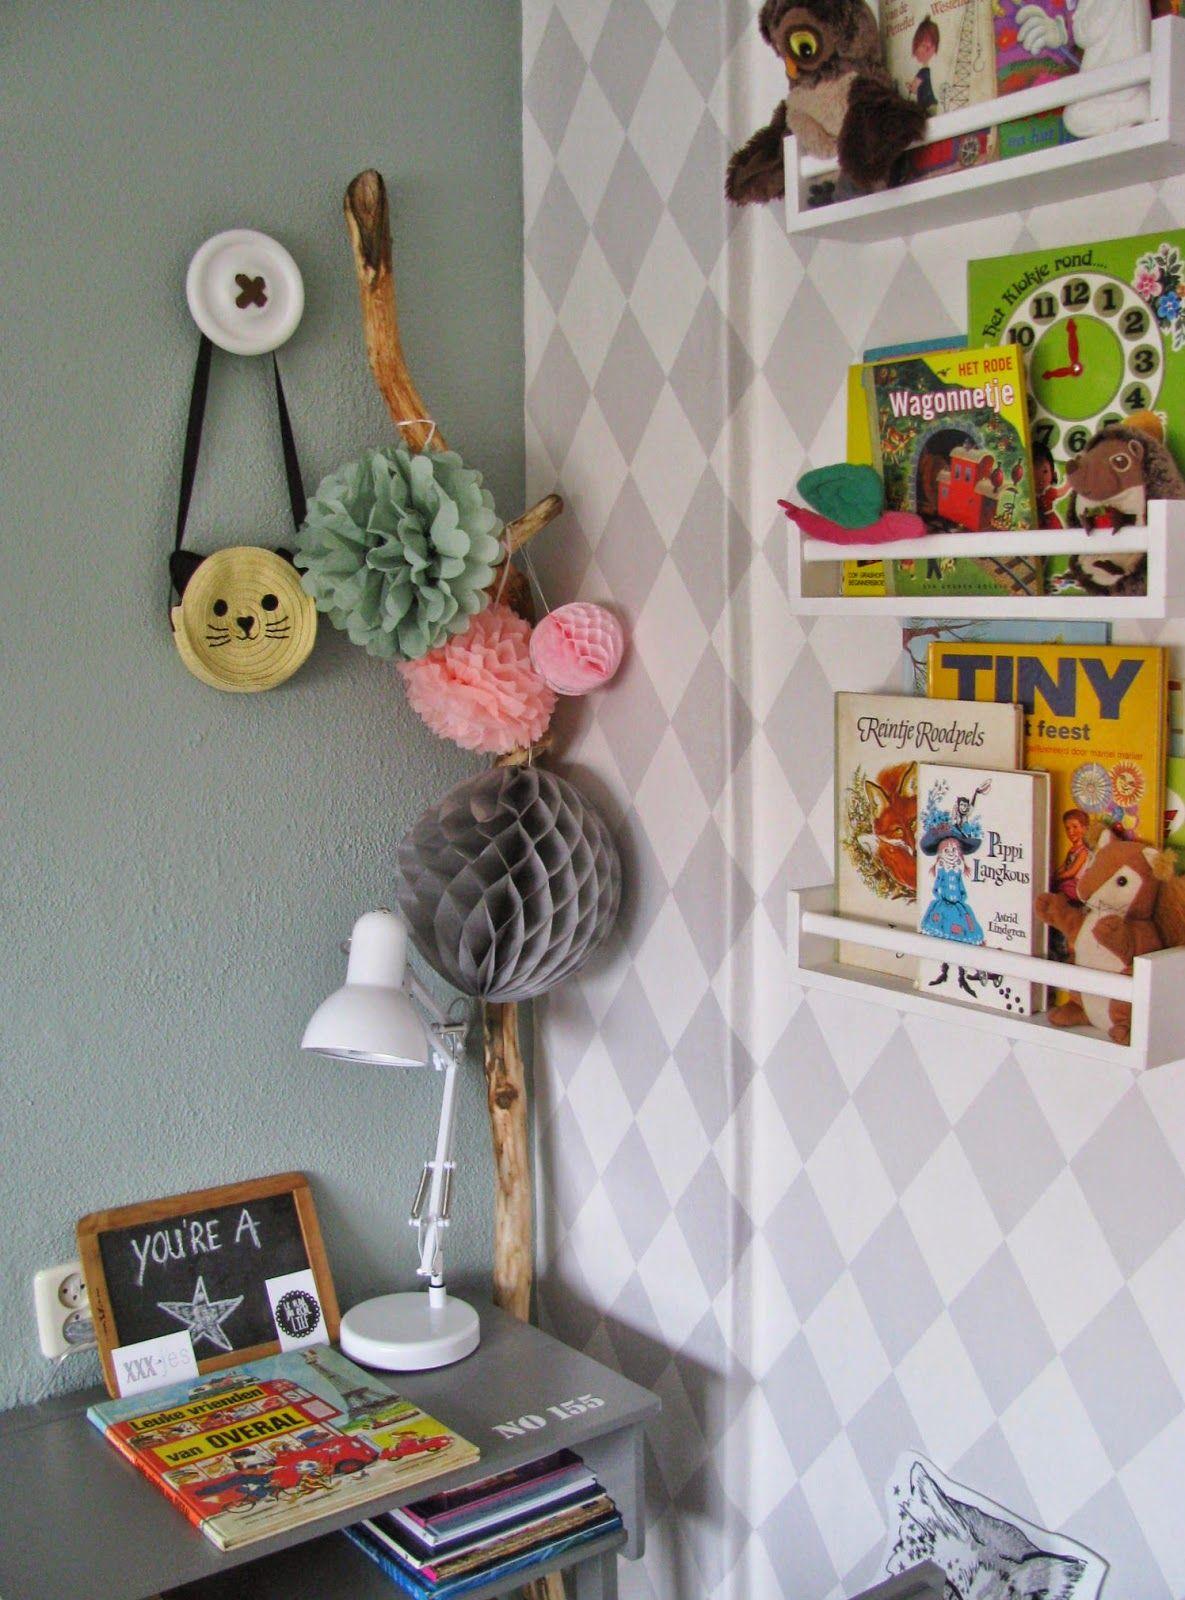 N Toefje Kleur Early Dew Babykamer Behang Kinderkamer Huisinrichting